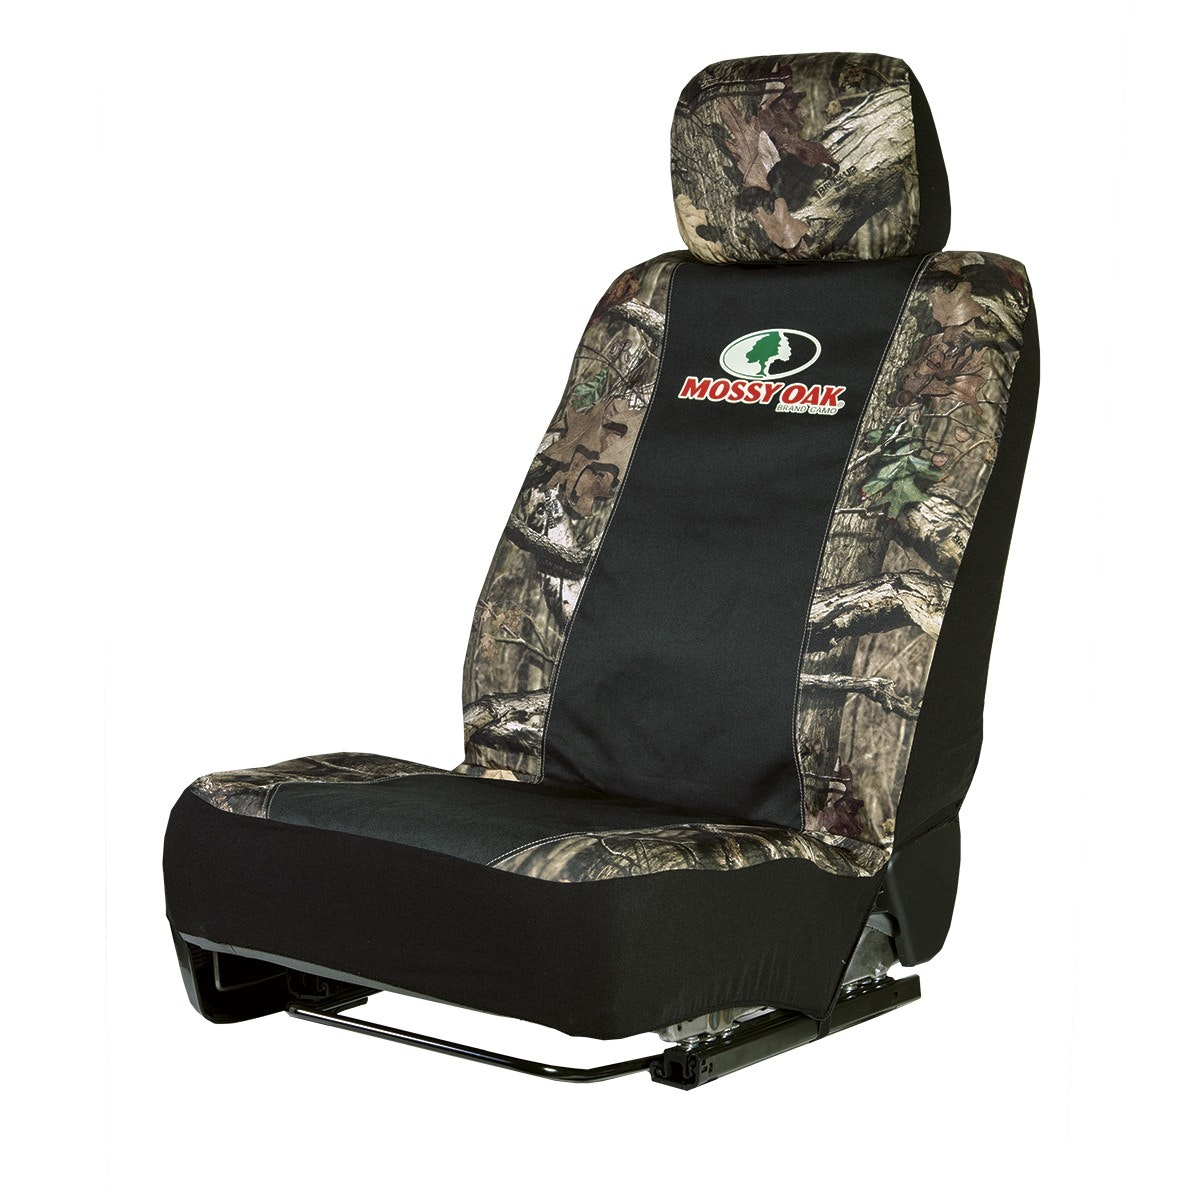 Mossy Oak Universal Fit Seat Cover Lowback Break Up